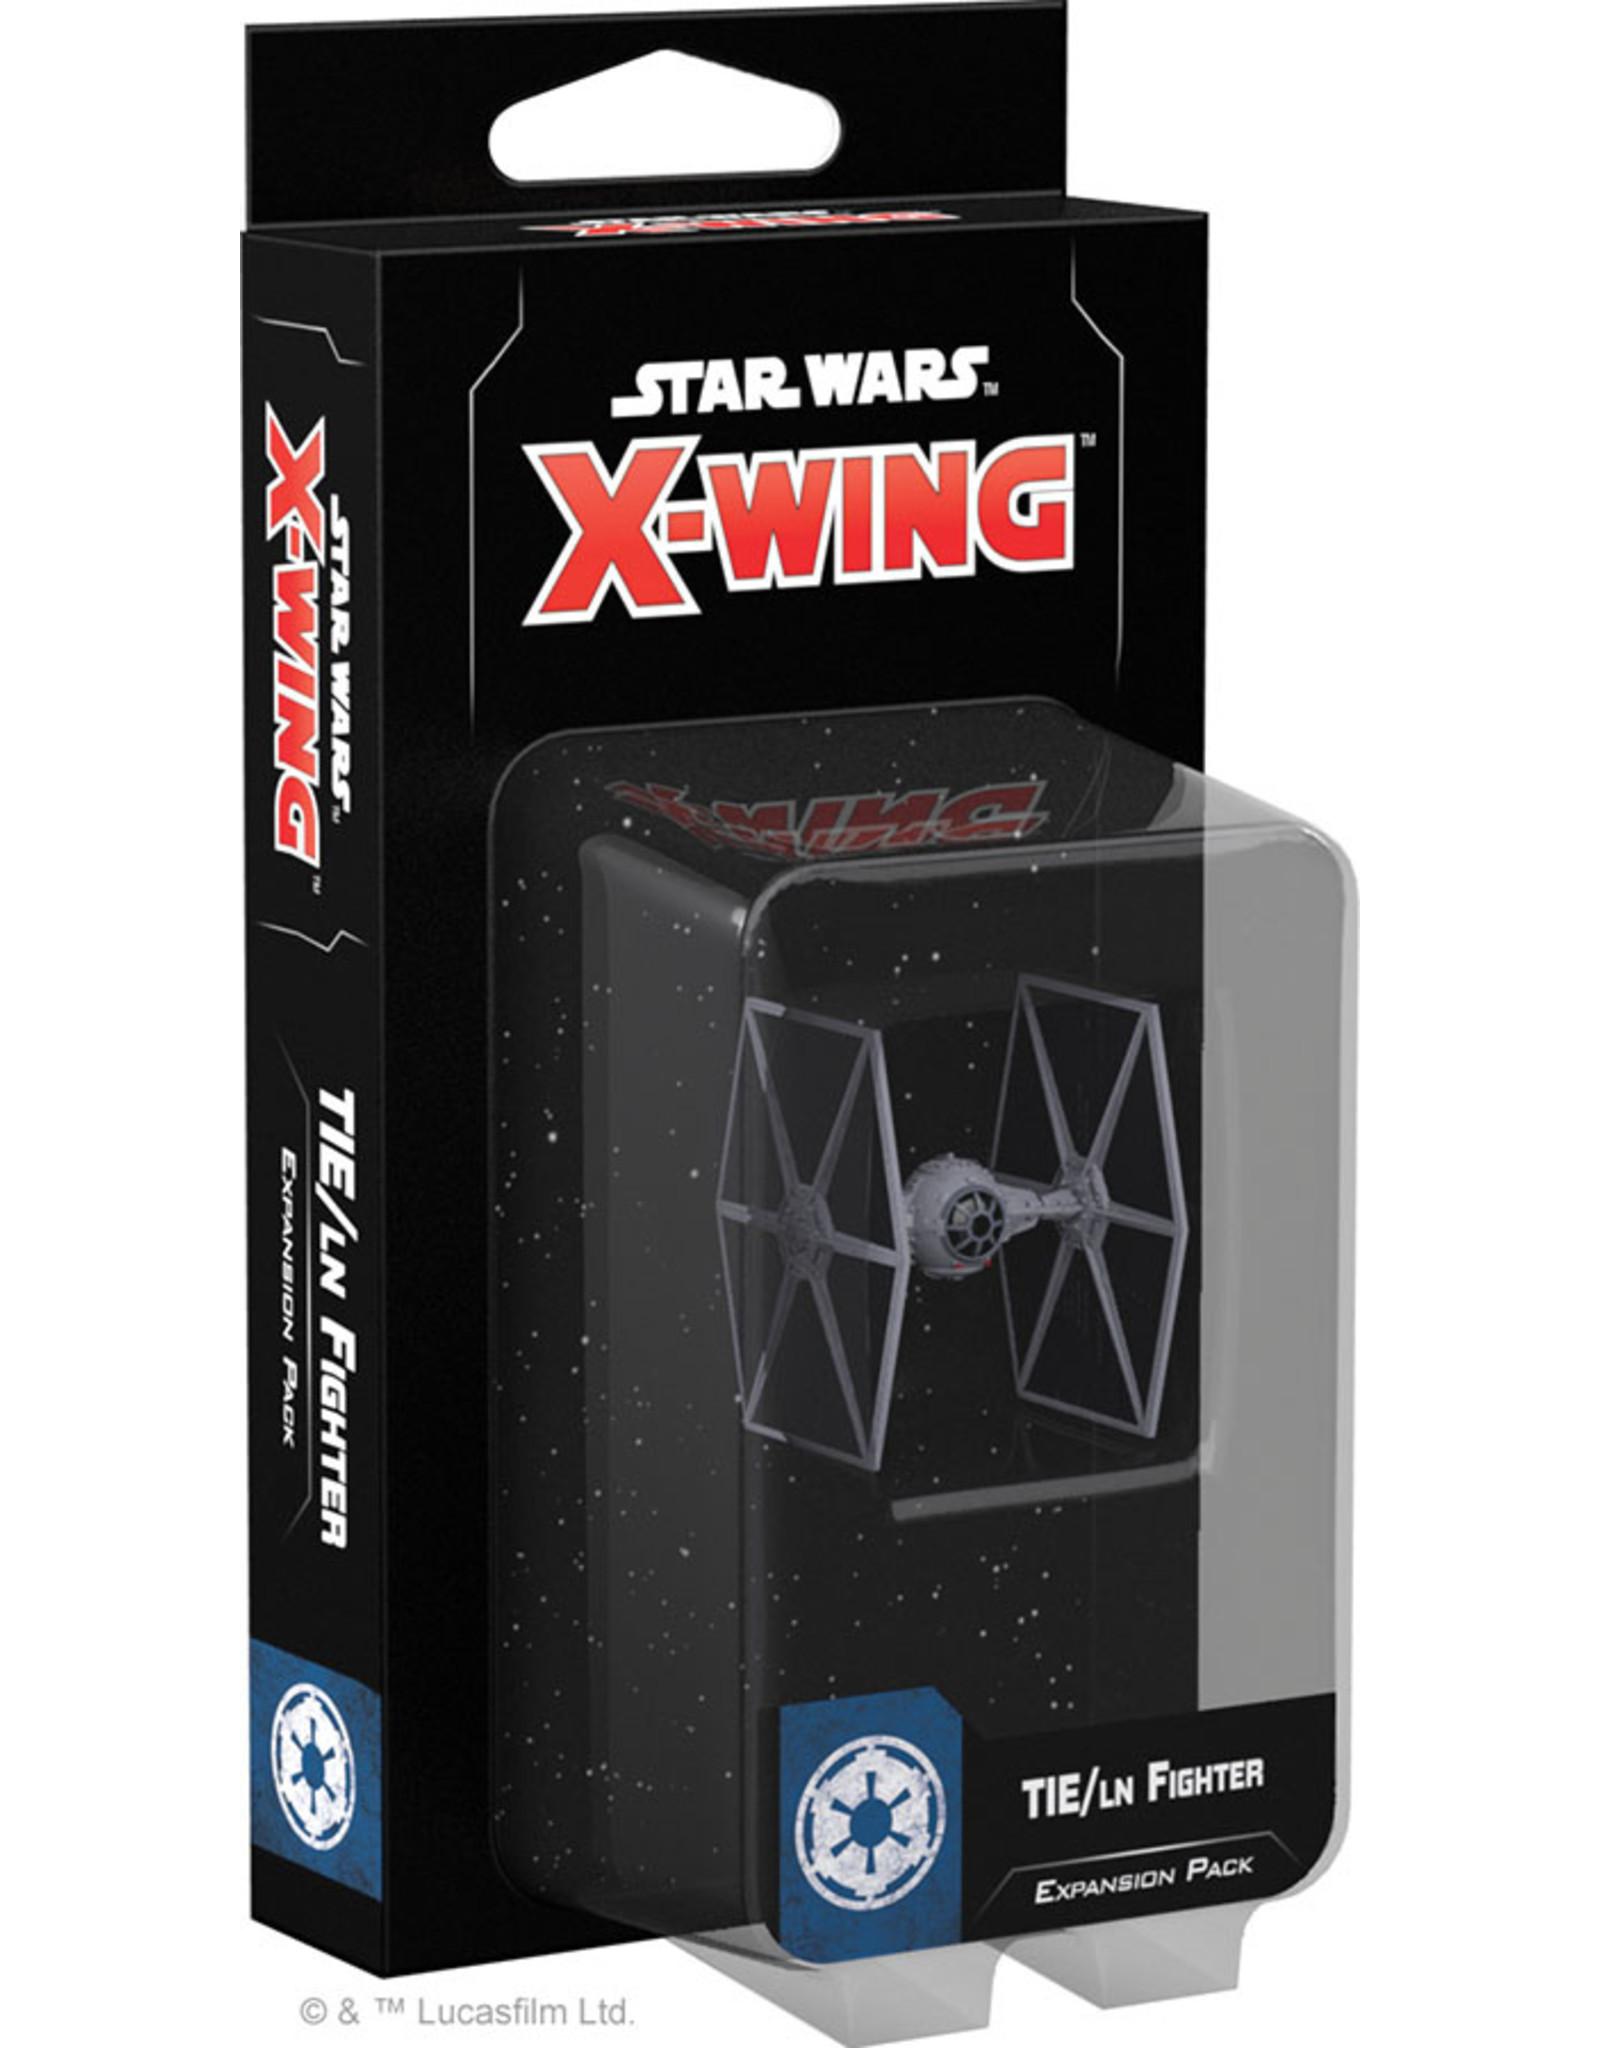 Fantasy Flight Games Star Wars X-Wing: 2nd Edition - TIE/LN Fighter